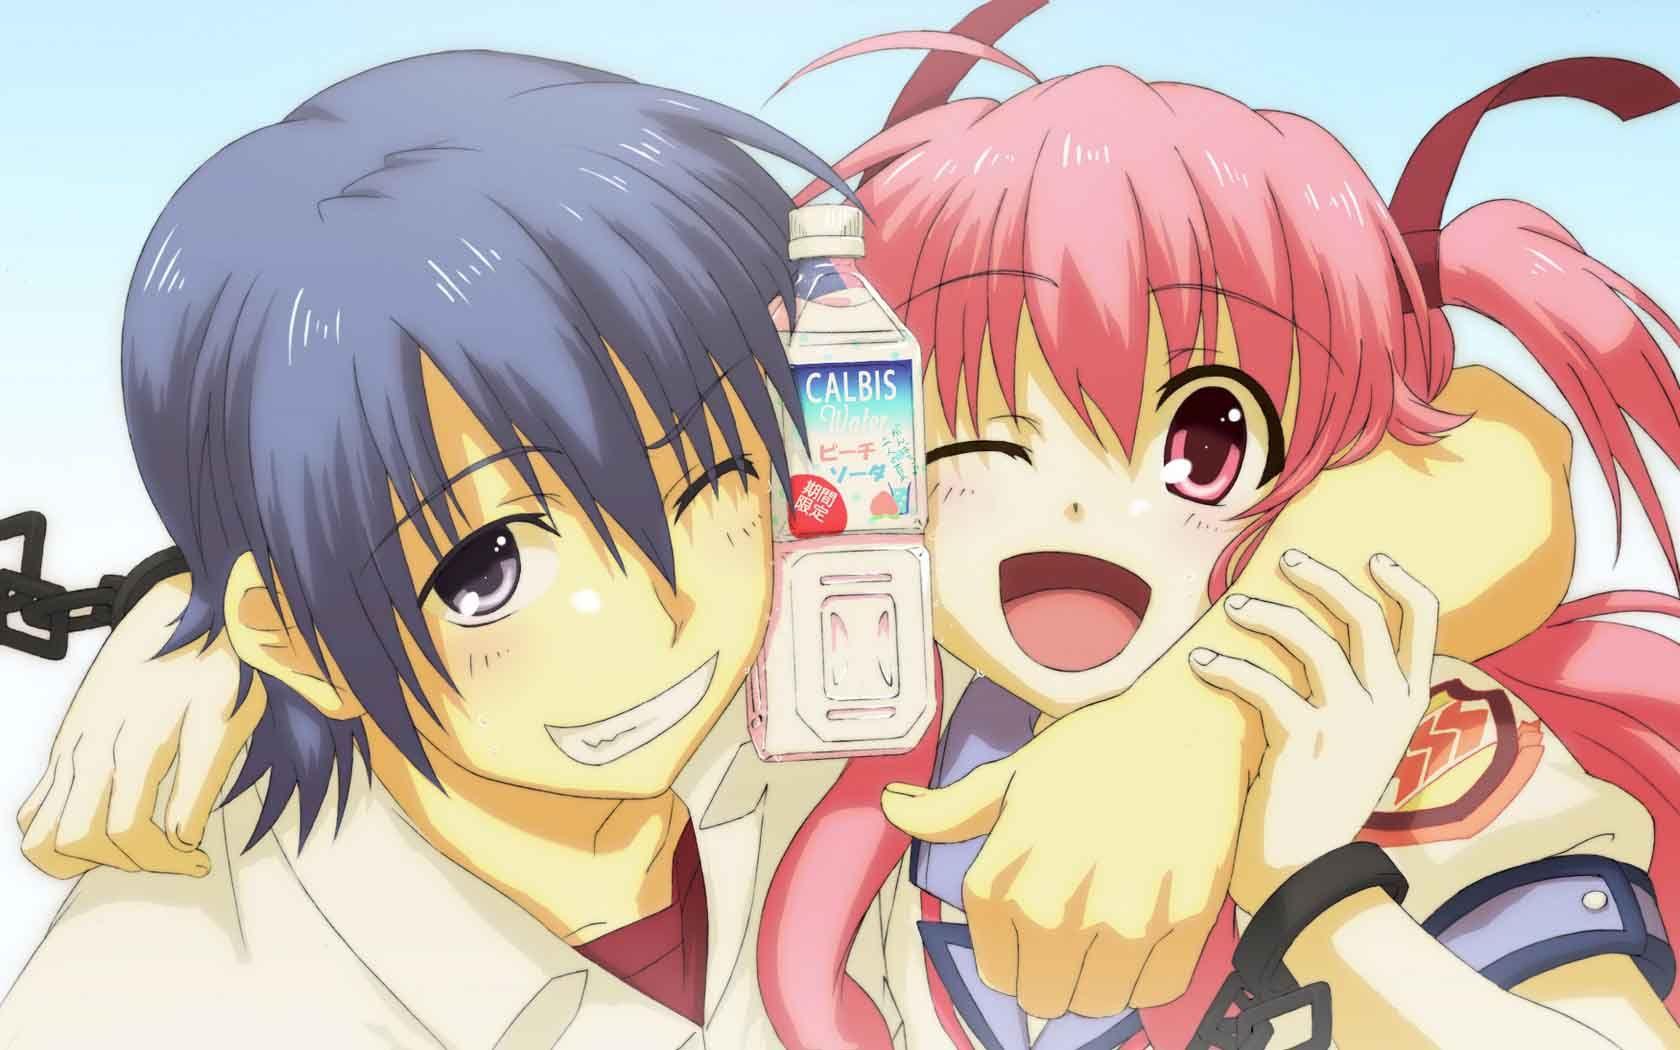 Anime Couple Hug Latest HD Wallpapers Free Download